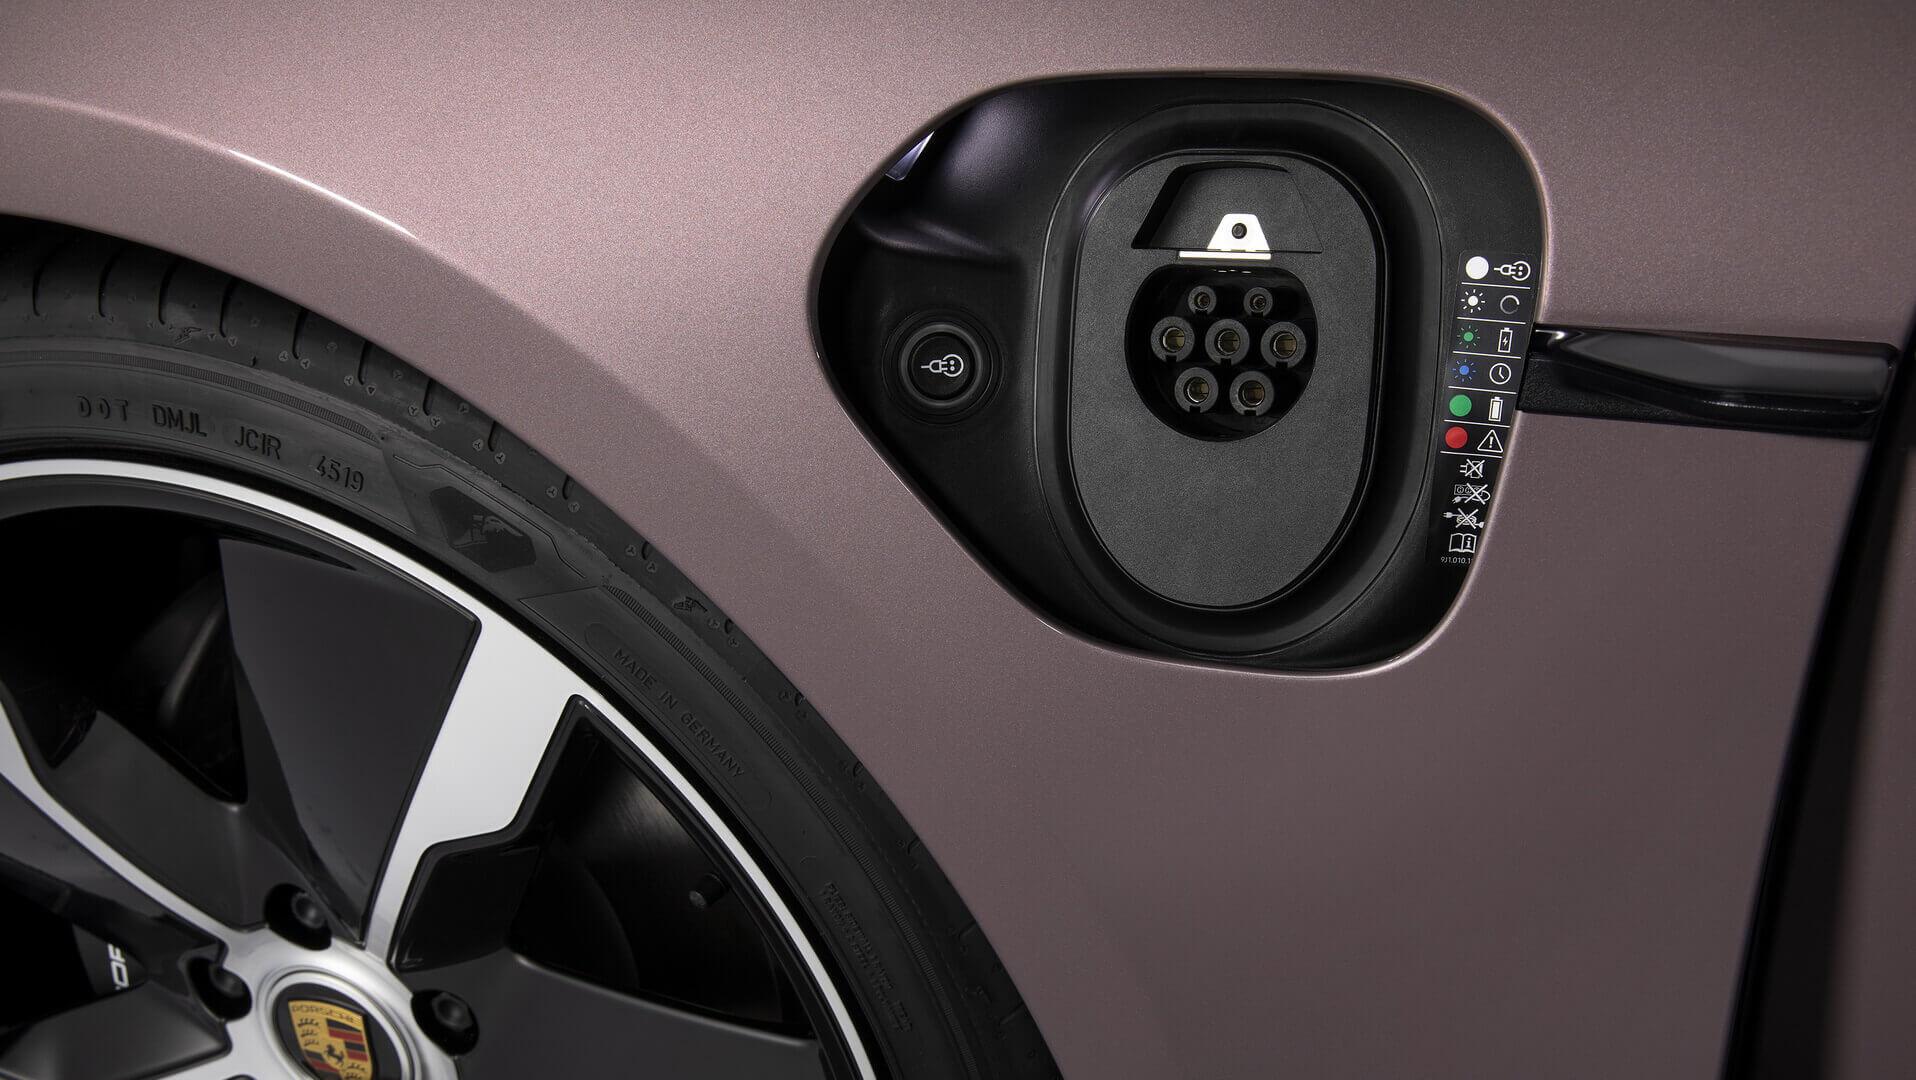 Порт GB/T 20234 переменнонго тока в Porsche Taycan